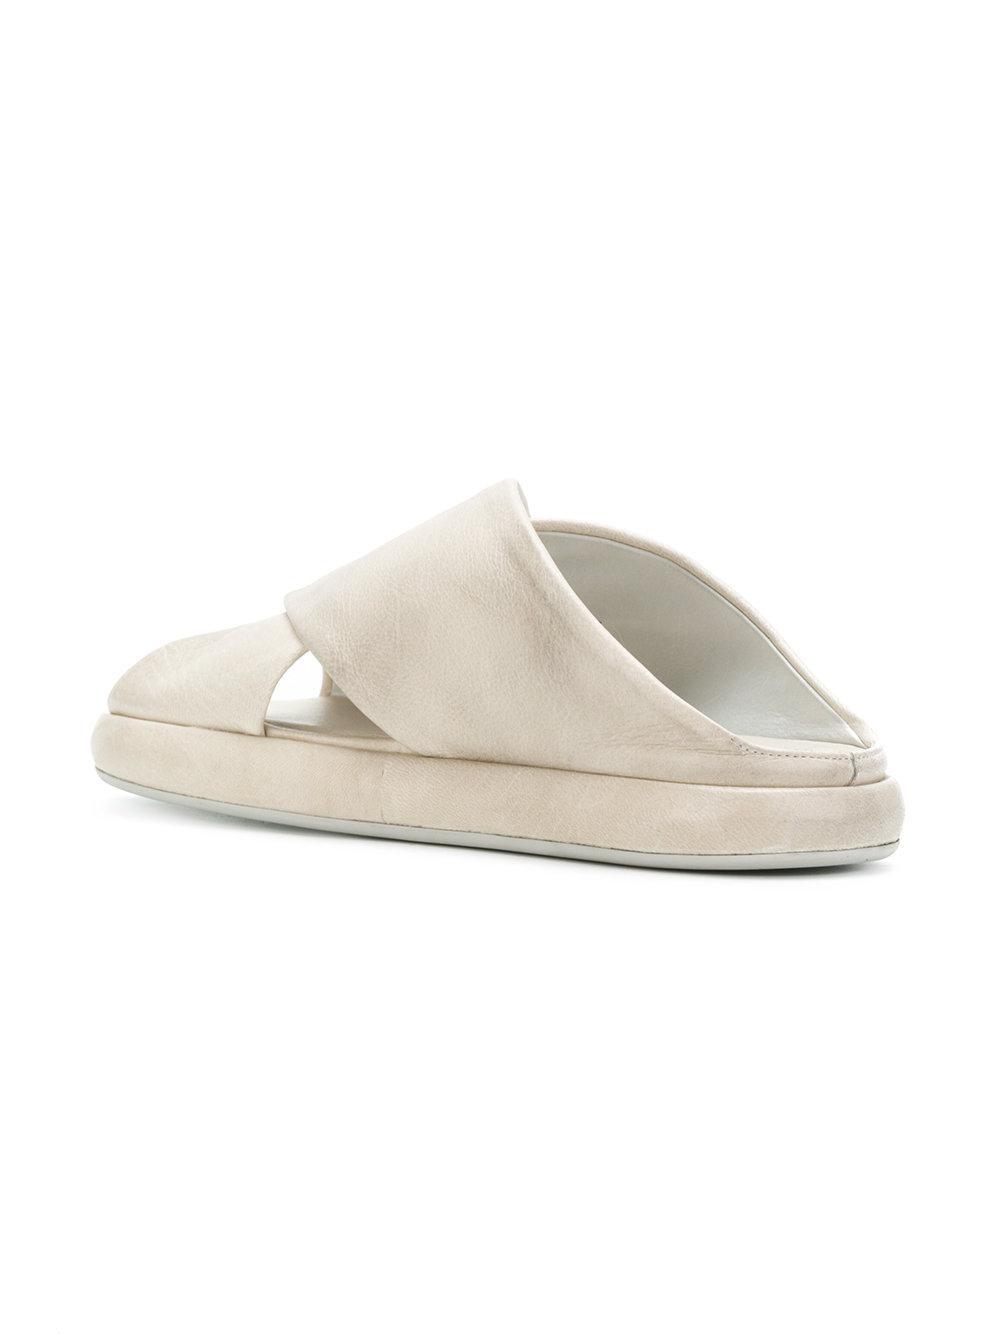 6b272c1445dd57 ... Strap Sandals for Men - Lyst. View fullscreen